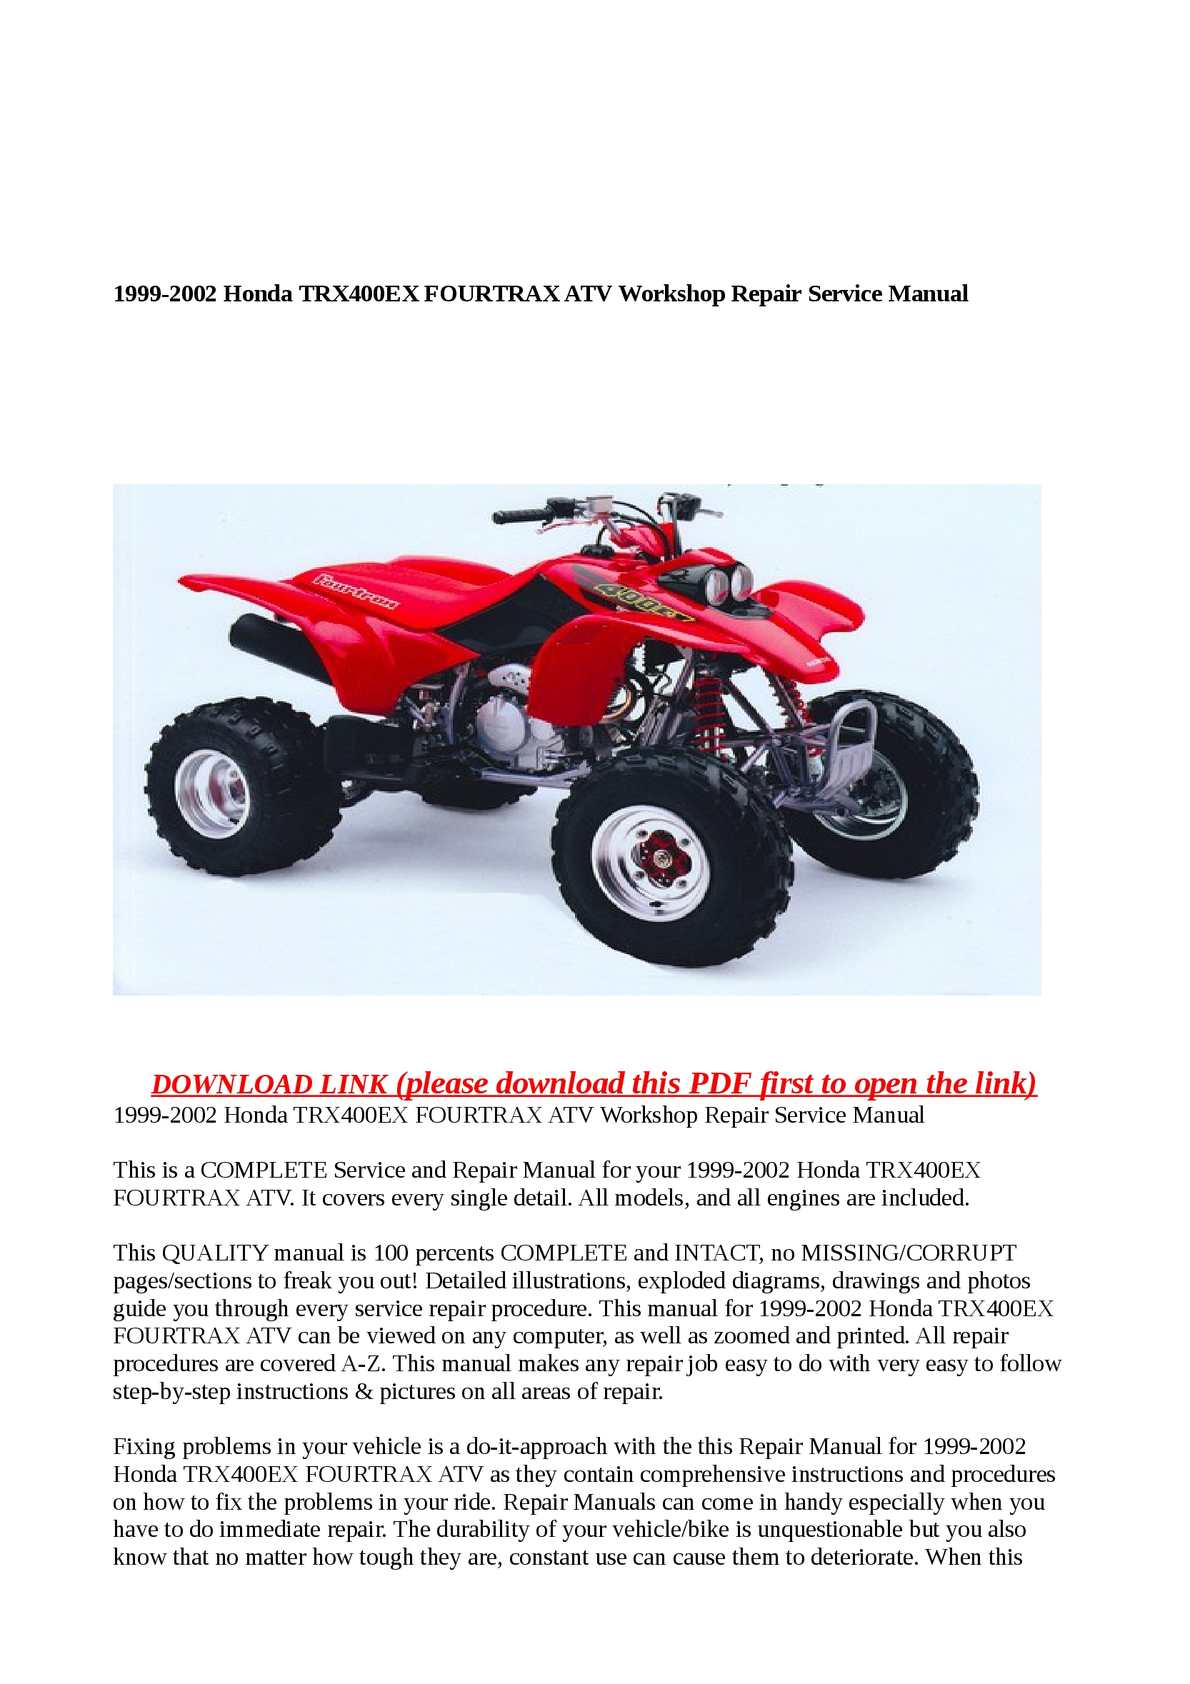 Calaméo - 1999-2002 Honda TRX400EX FOURTRAX ATV Workshop Repair Service  Manual